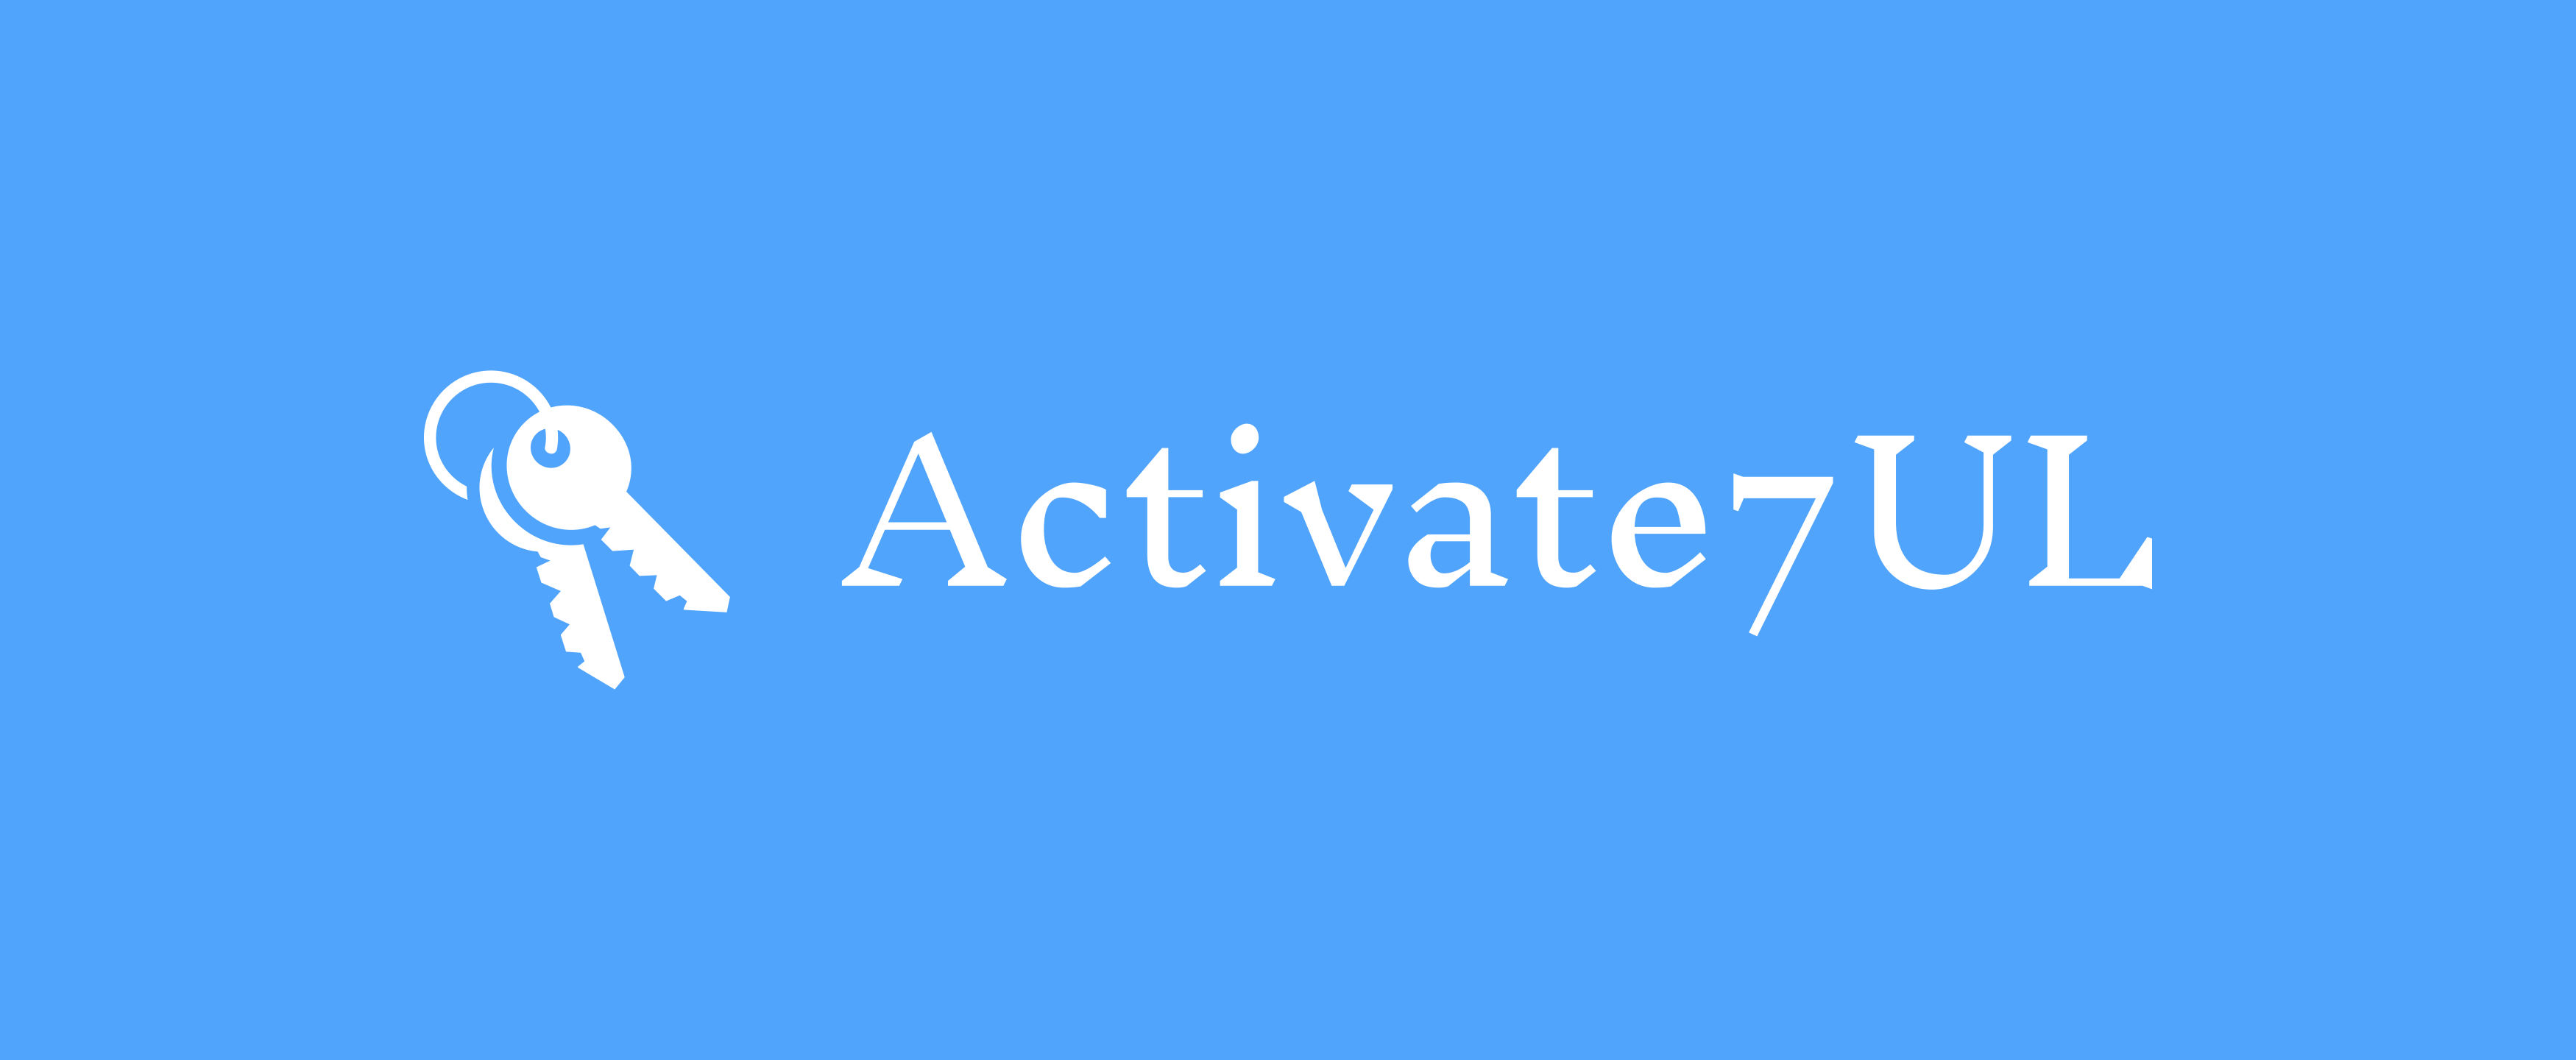 Activate7UL - Win7 Legacy/UEFI/VL 激活方案